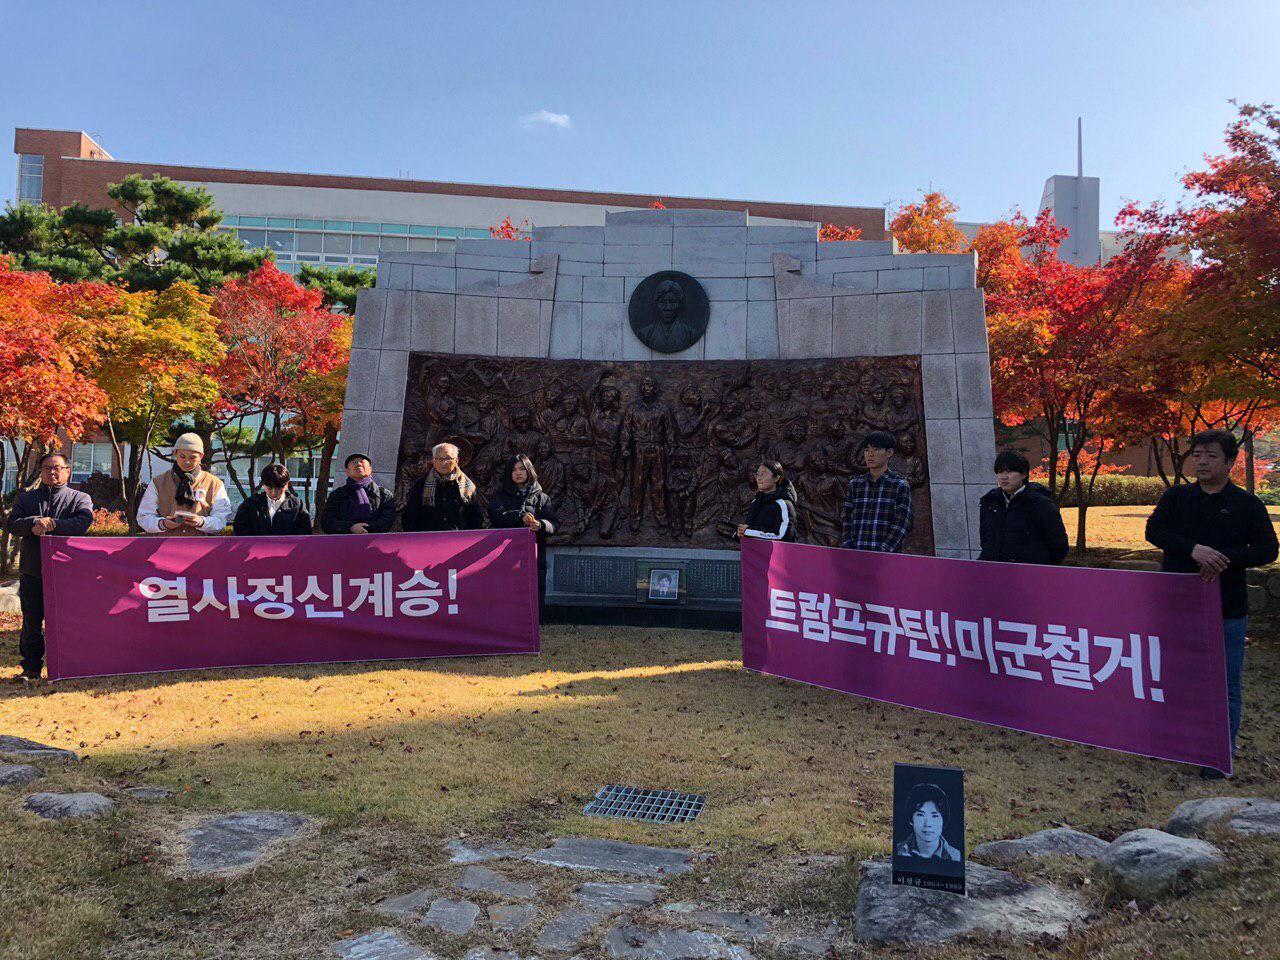 photo_2019-11-15_09-22-14.jpg